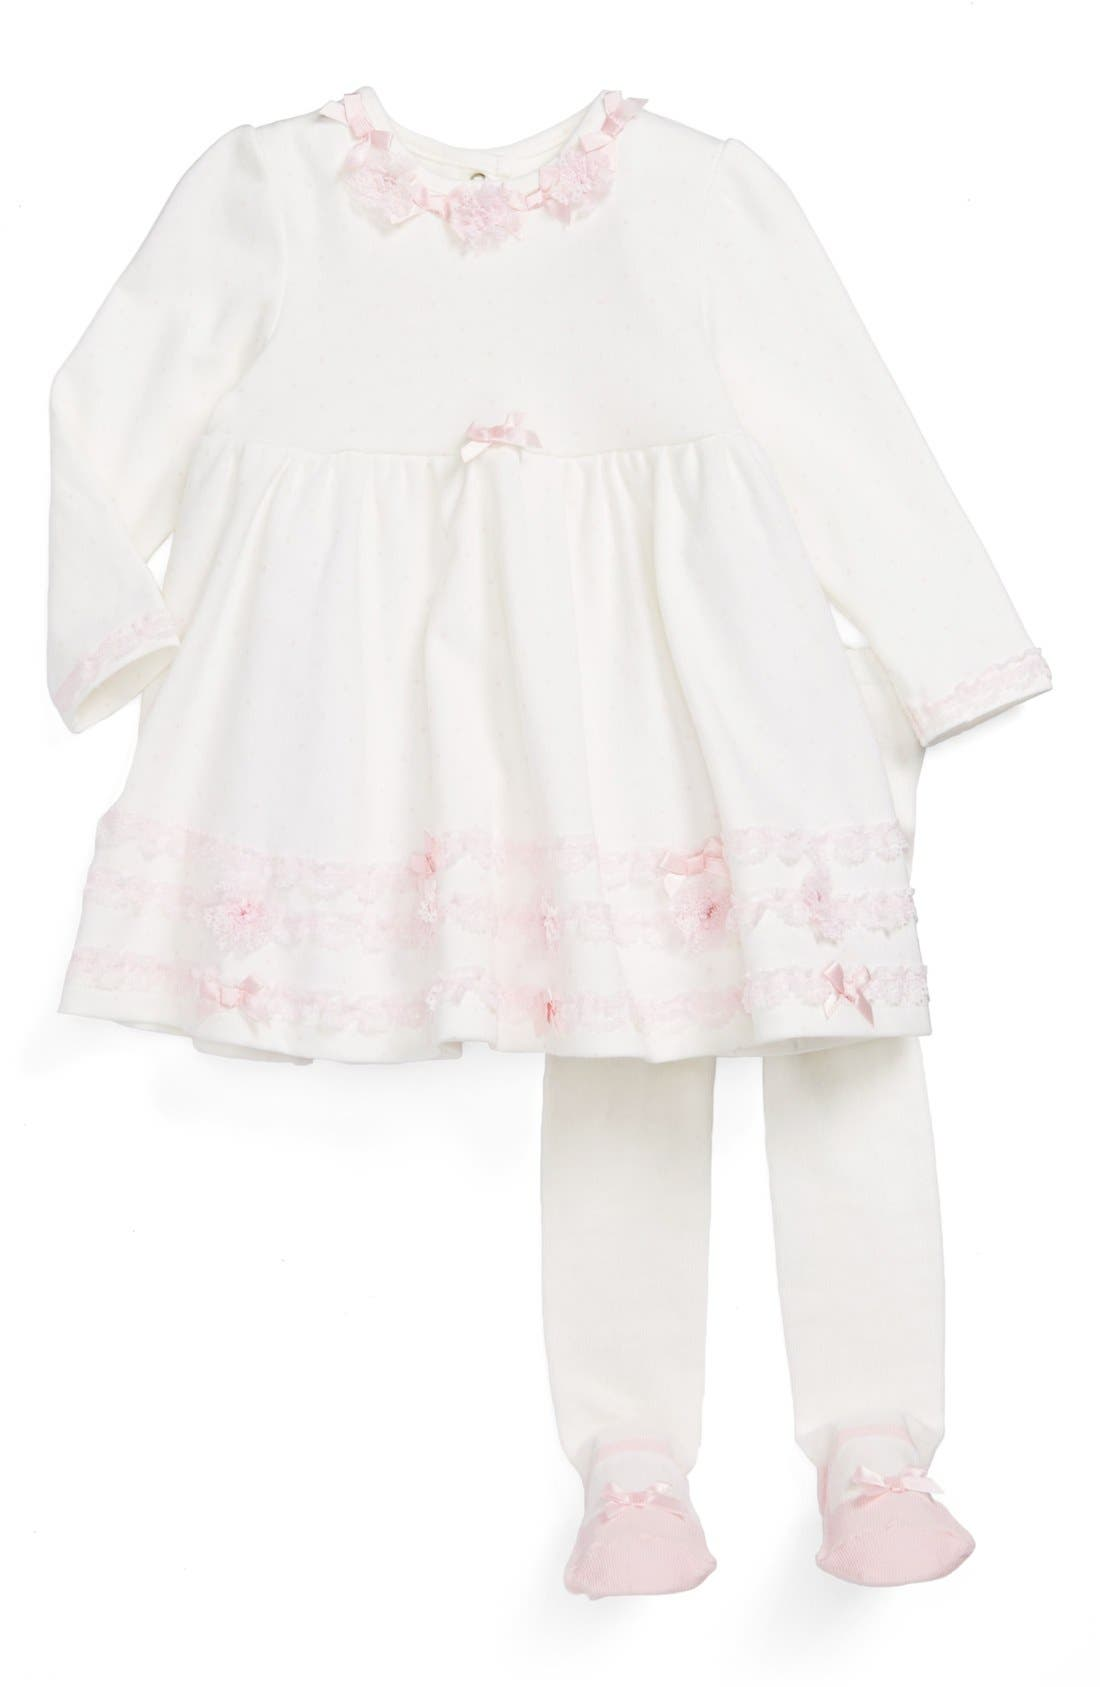 Main Image - Little Me Long Sleeve Lace Trim Dress & Footie Leggings (Baby Girls)